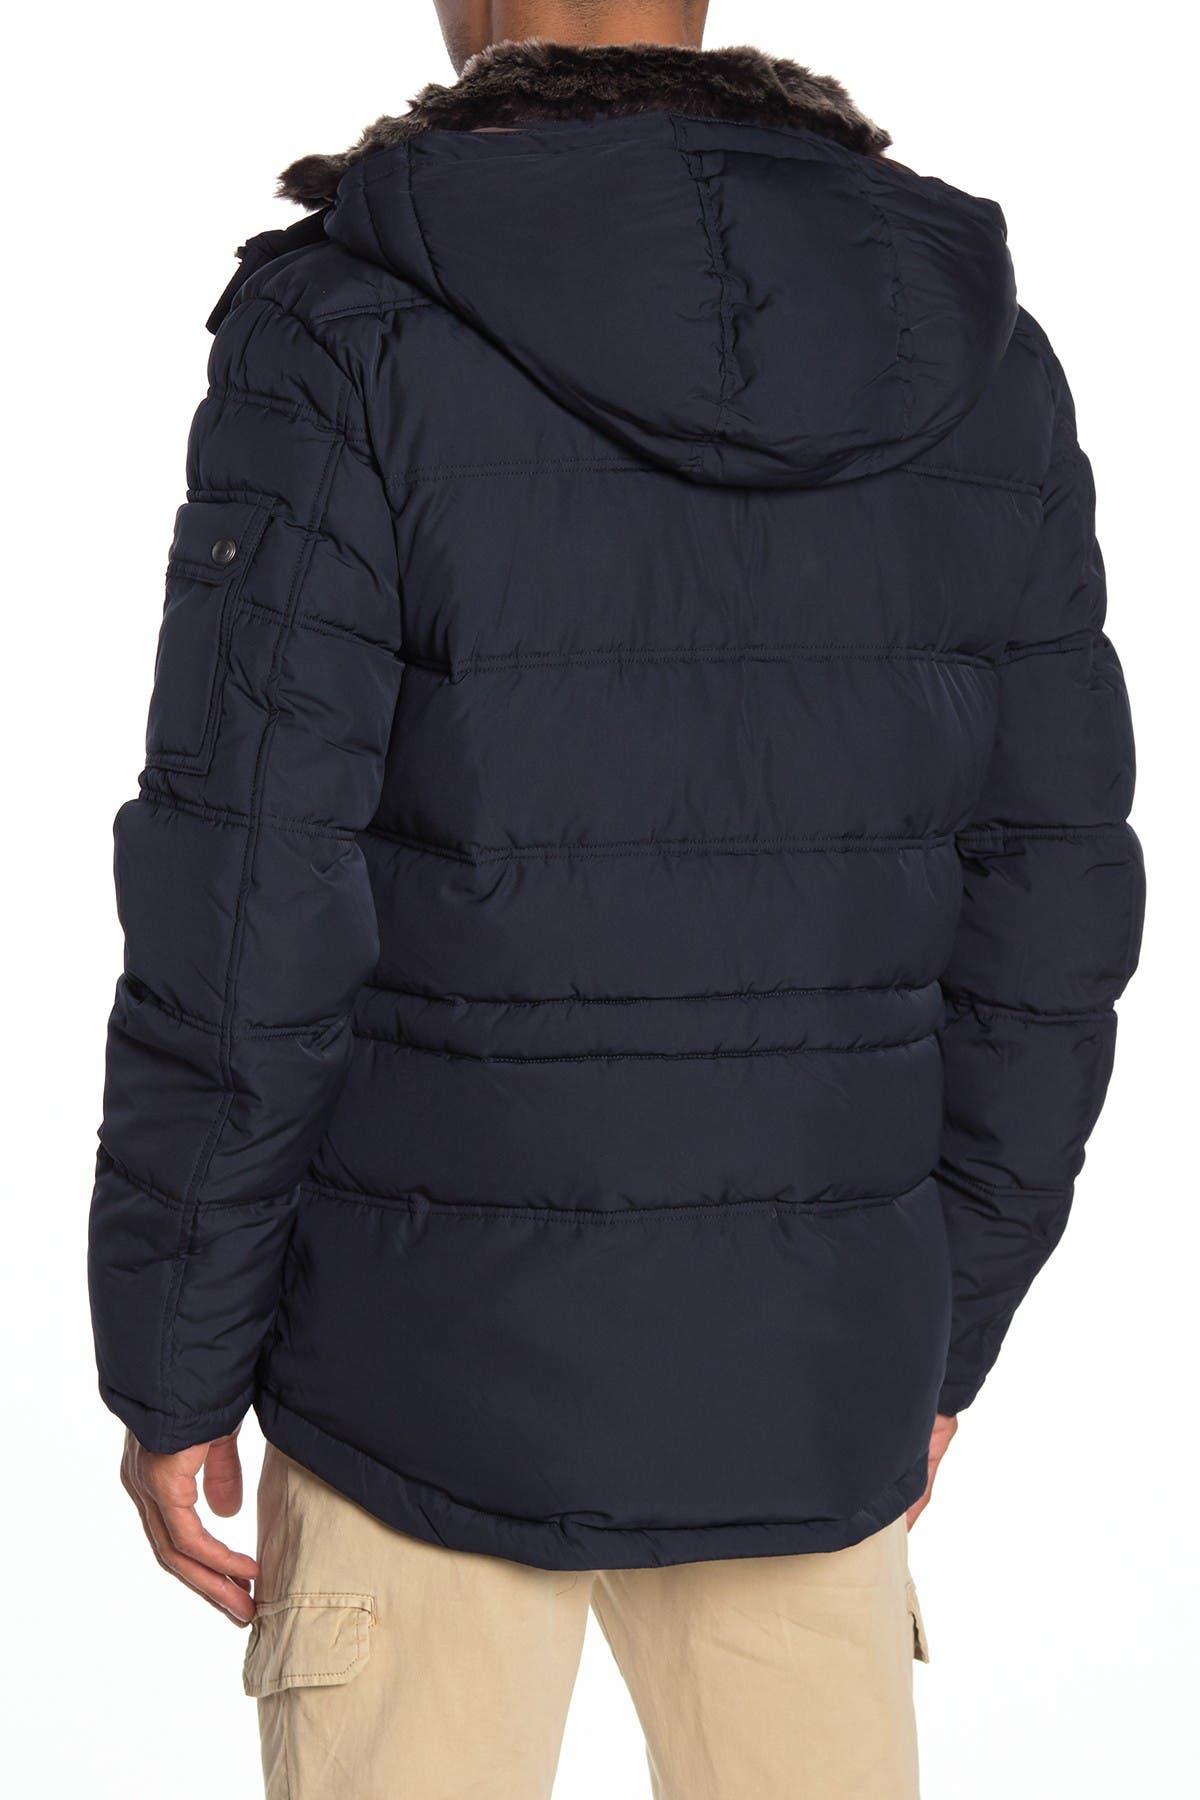 Image of Cole Haan Faux Fur Trim Hooded Zip Puffer Jacket